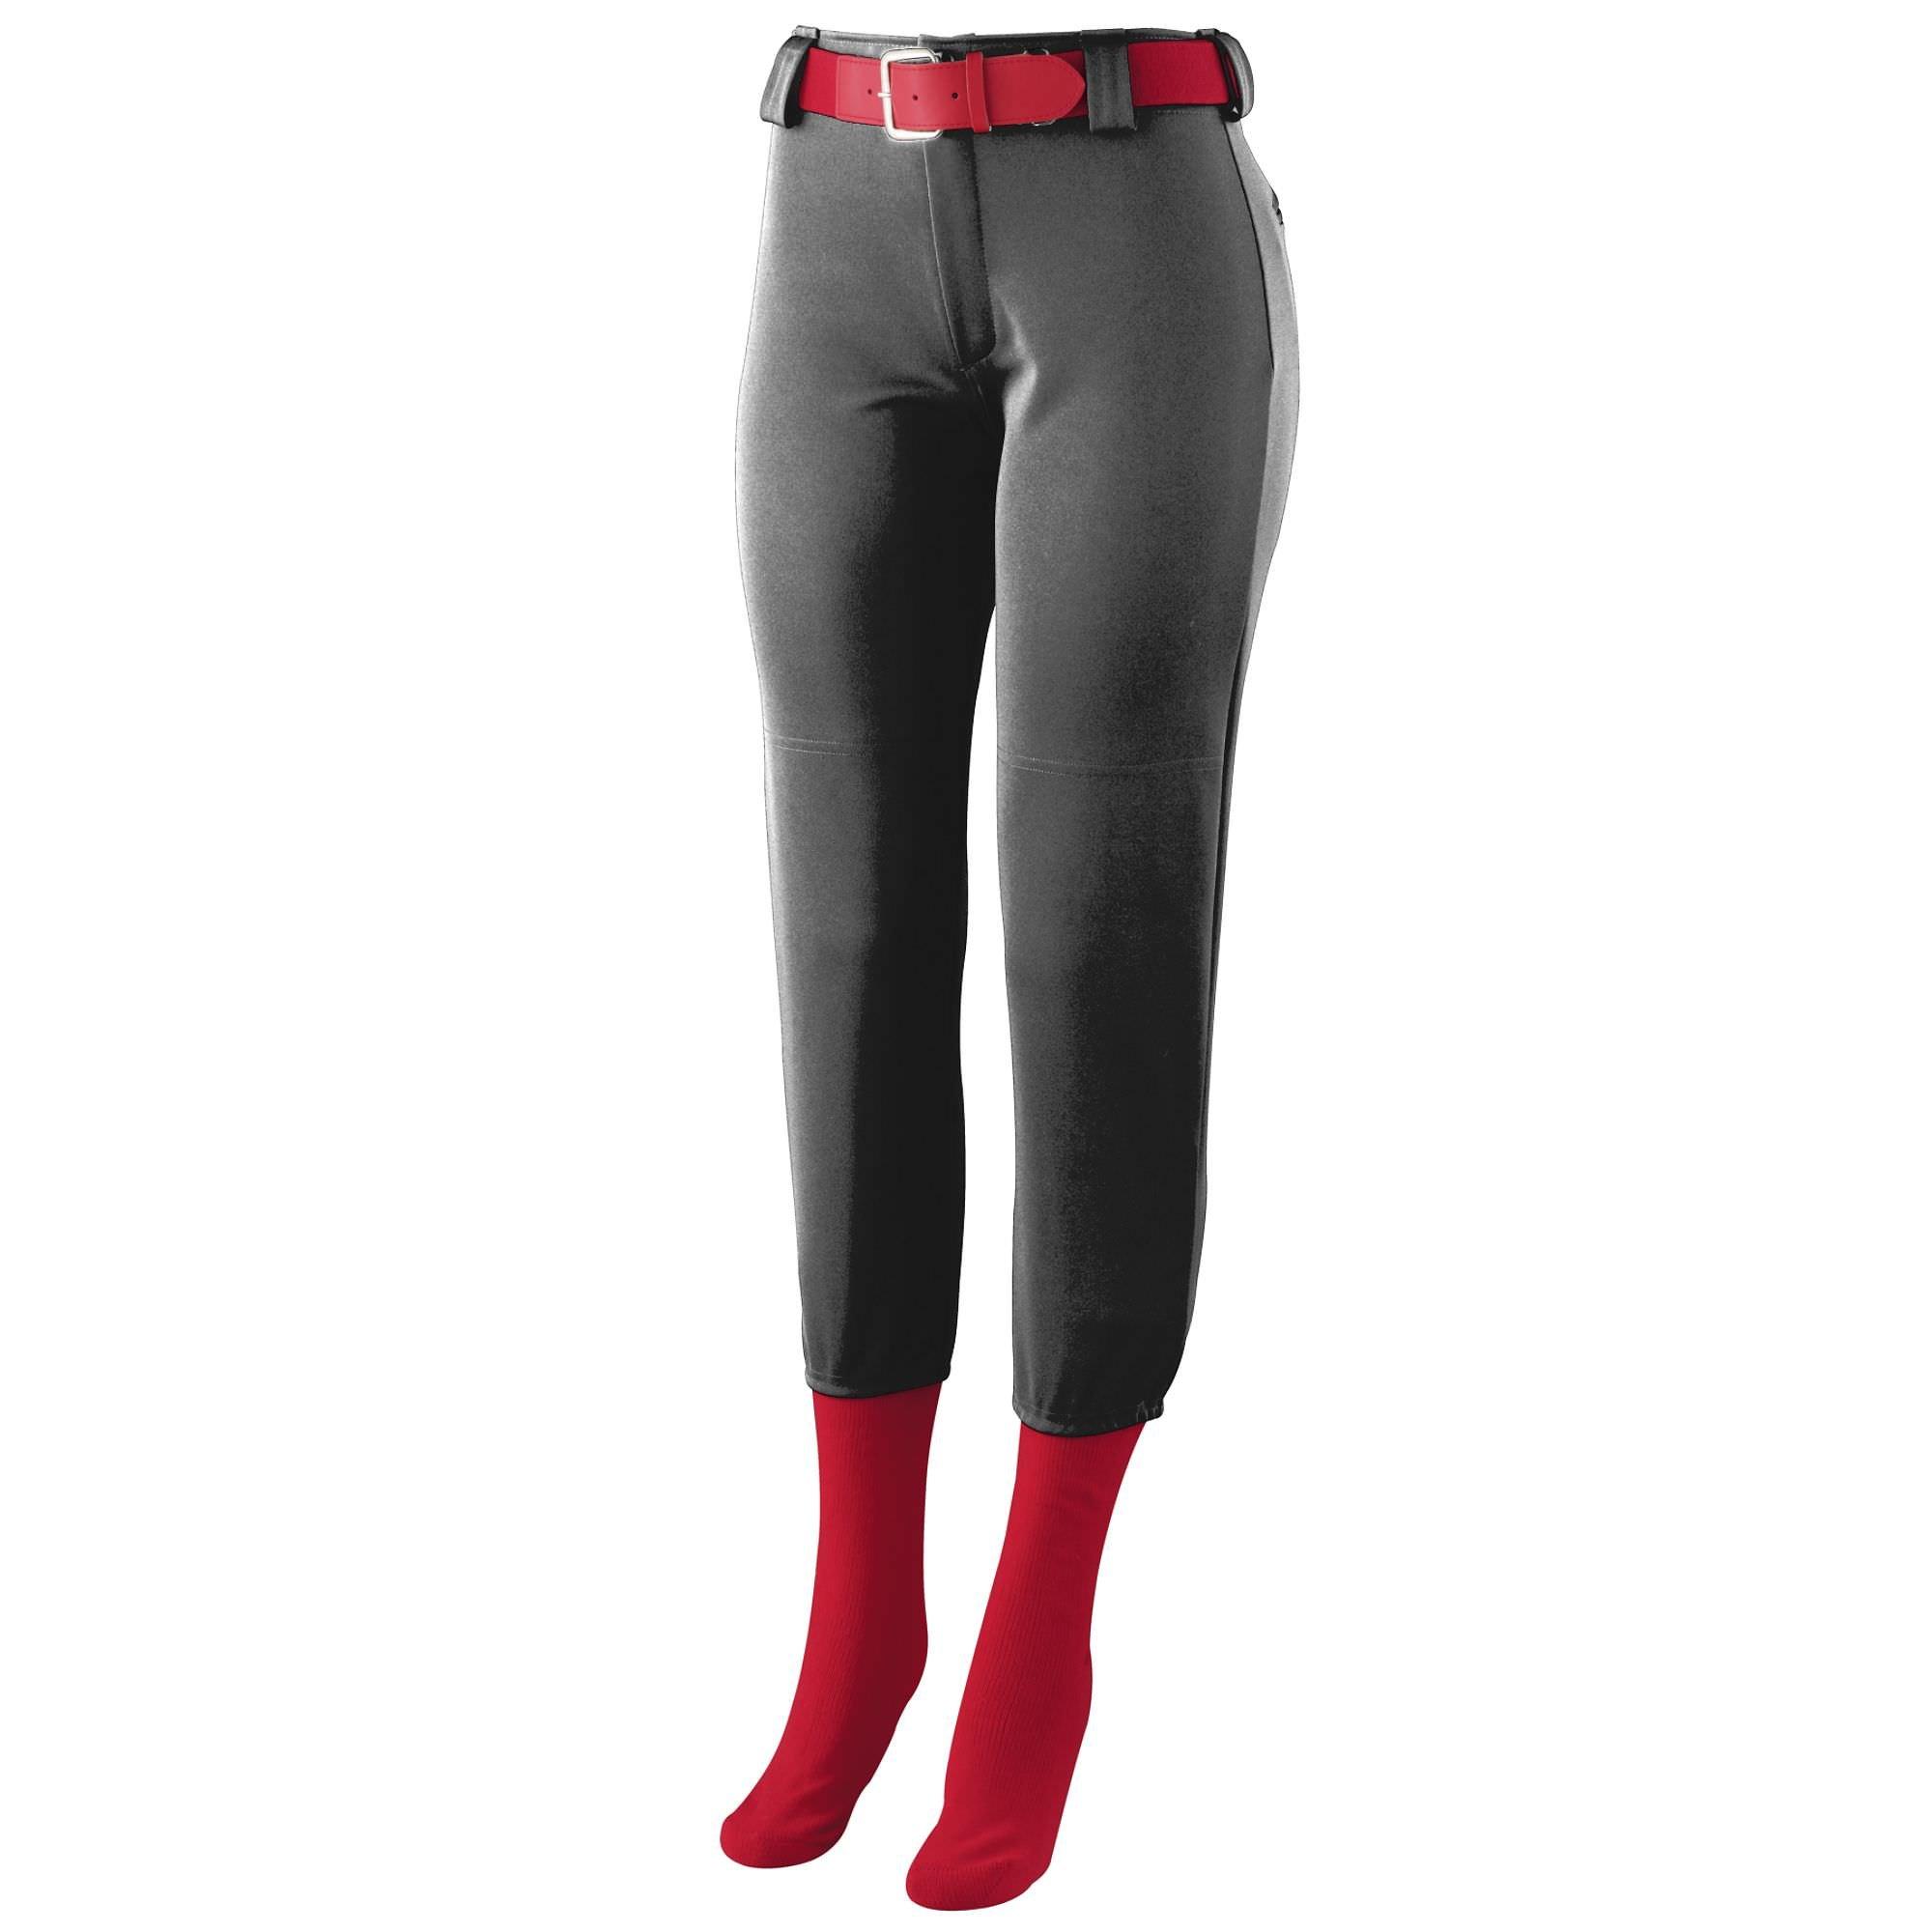 3cca214786d1a4 Best Rated in Women's Baseball & Softball Pants & Helpful Customer ...